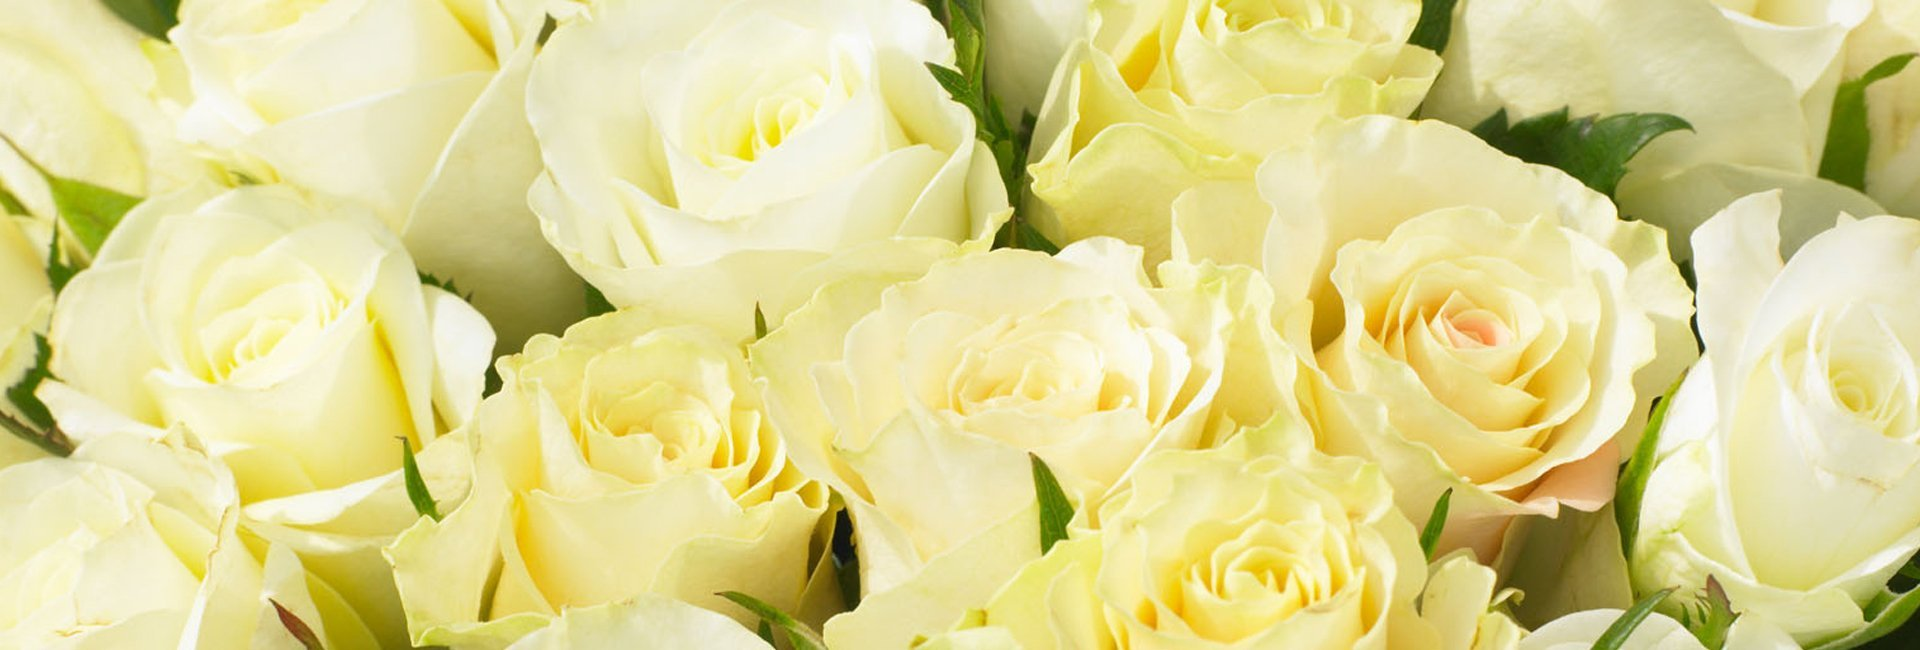 Pastel Yellow Roses